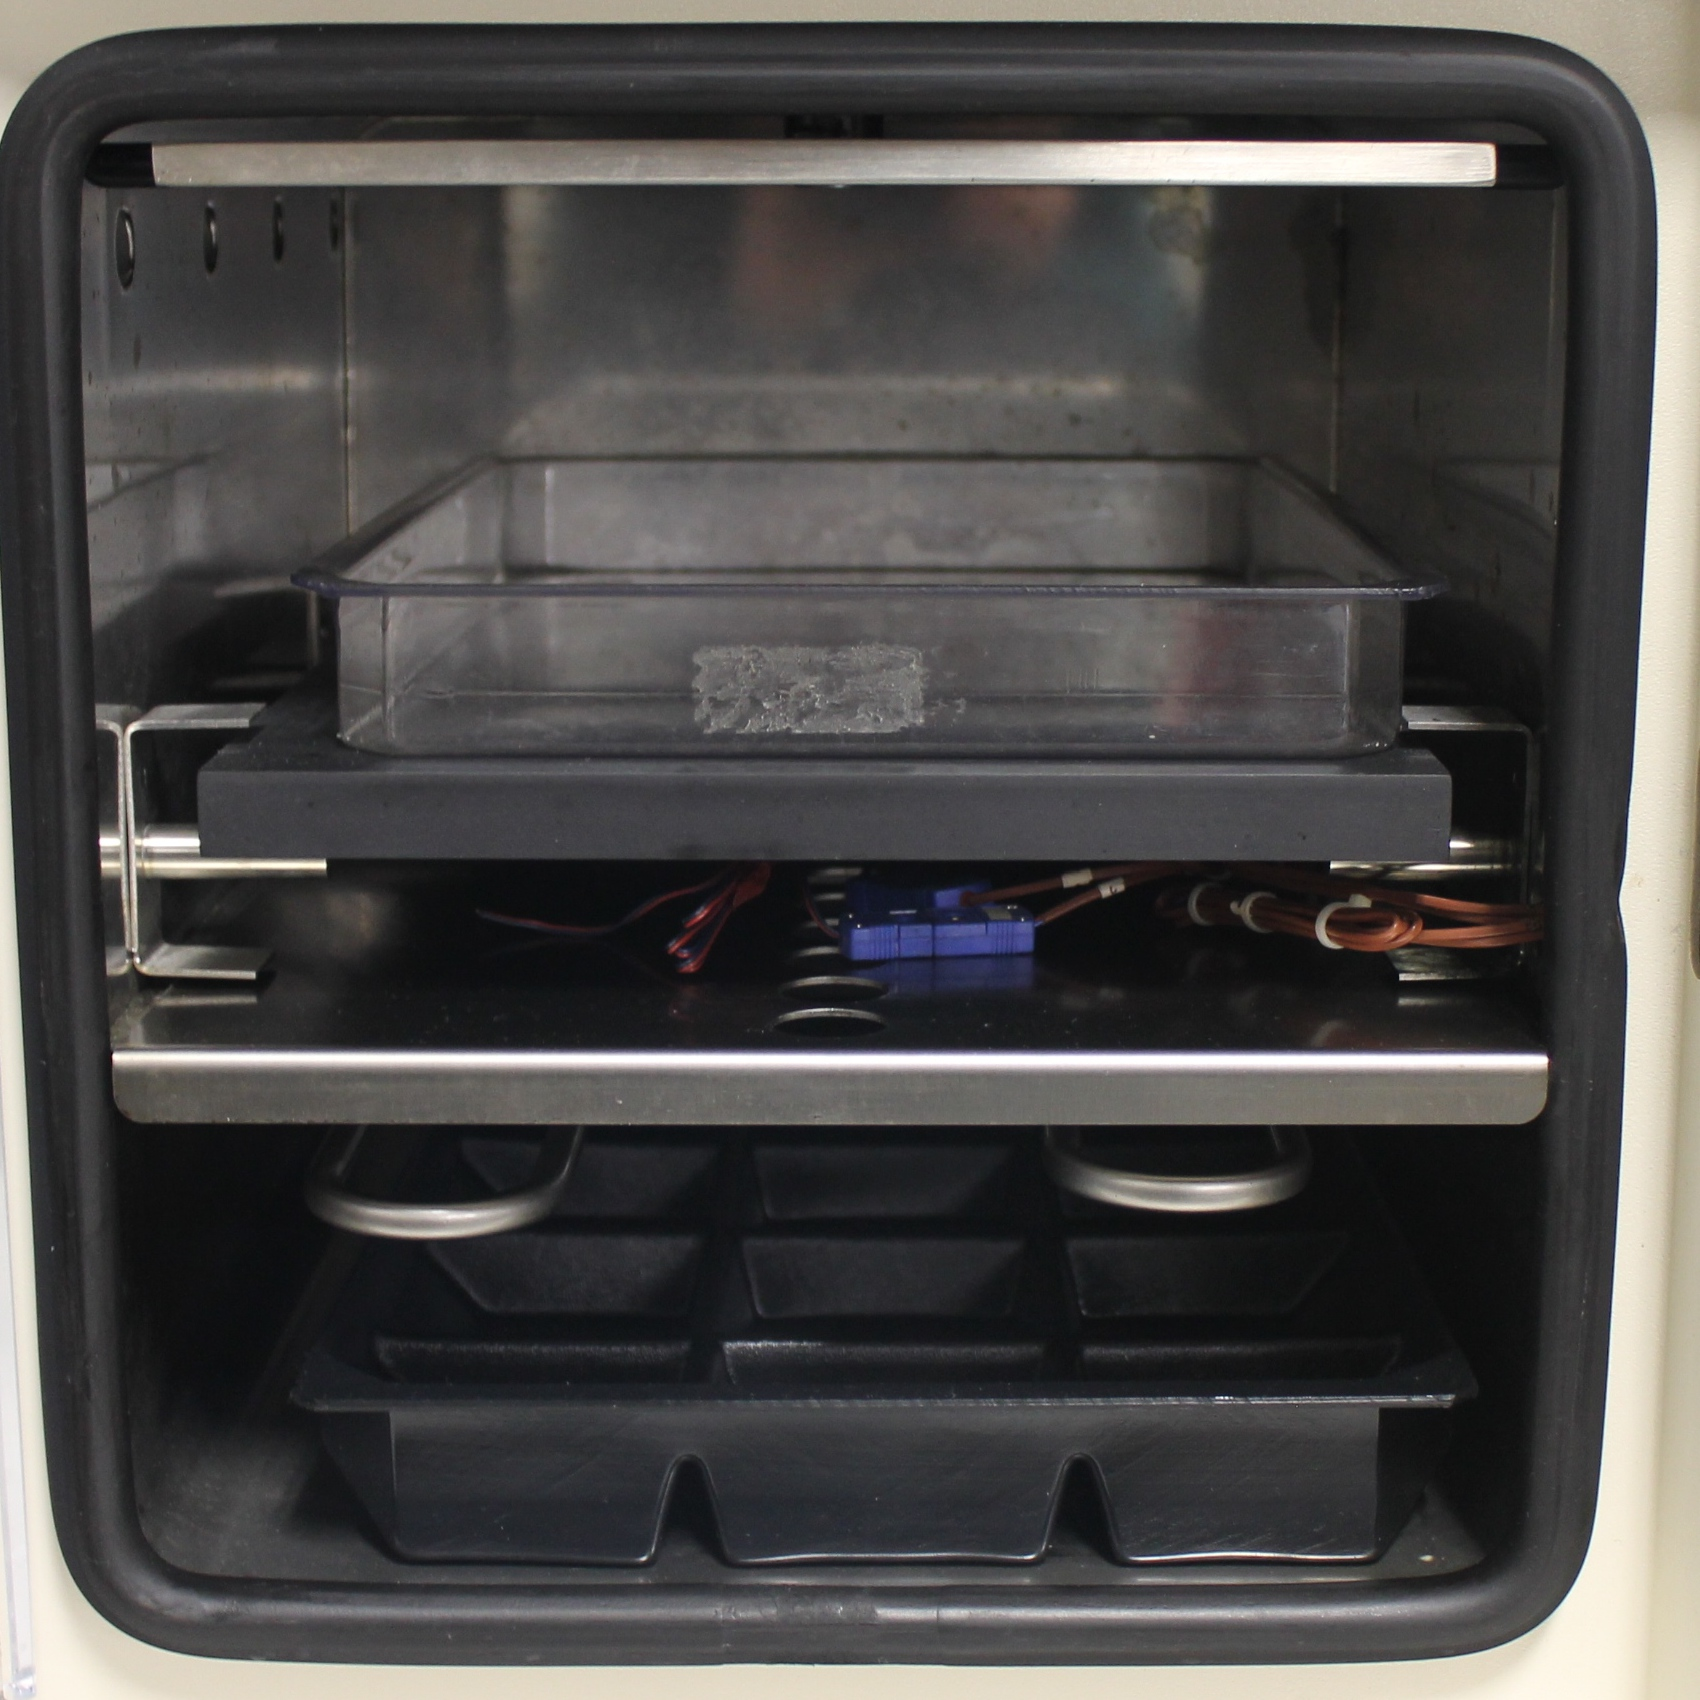 VirTis AdVantage Plus BenchTop Freeze Dryer Model XL-70 Image